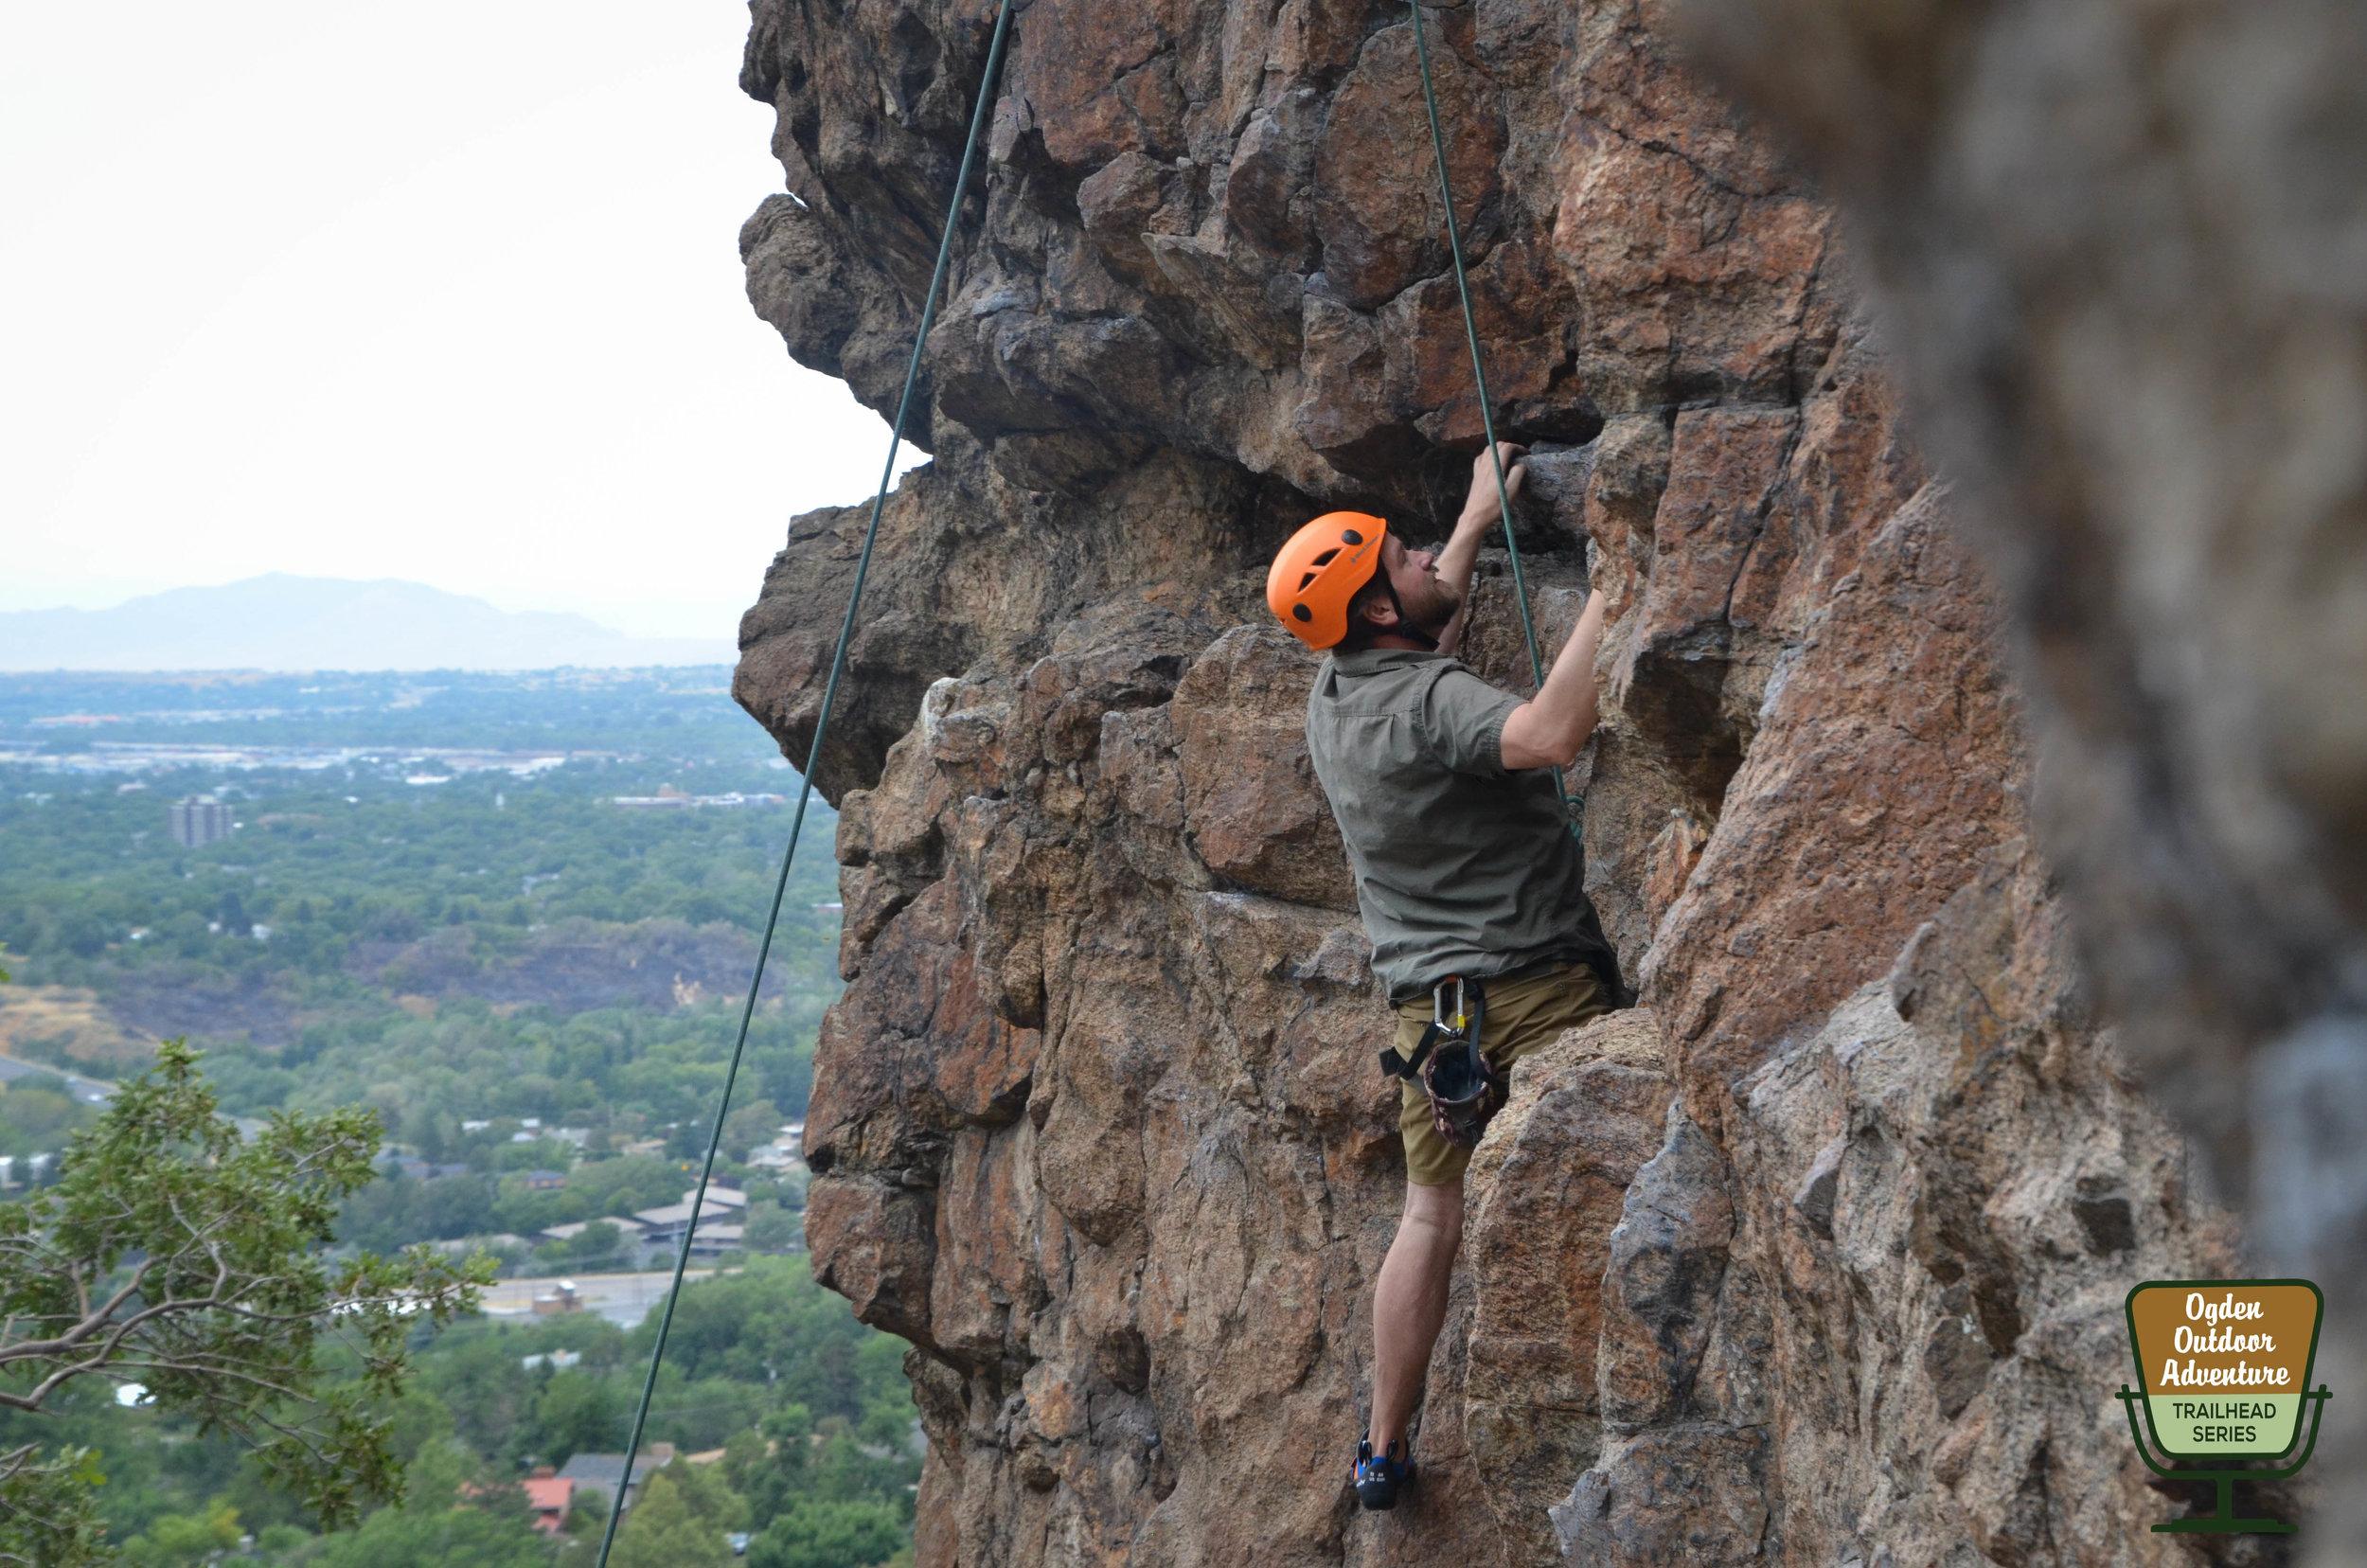 Ogden Outdoor Adventure Show 248 - Bear House Mountaineering-17.jpg